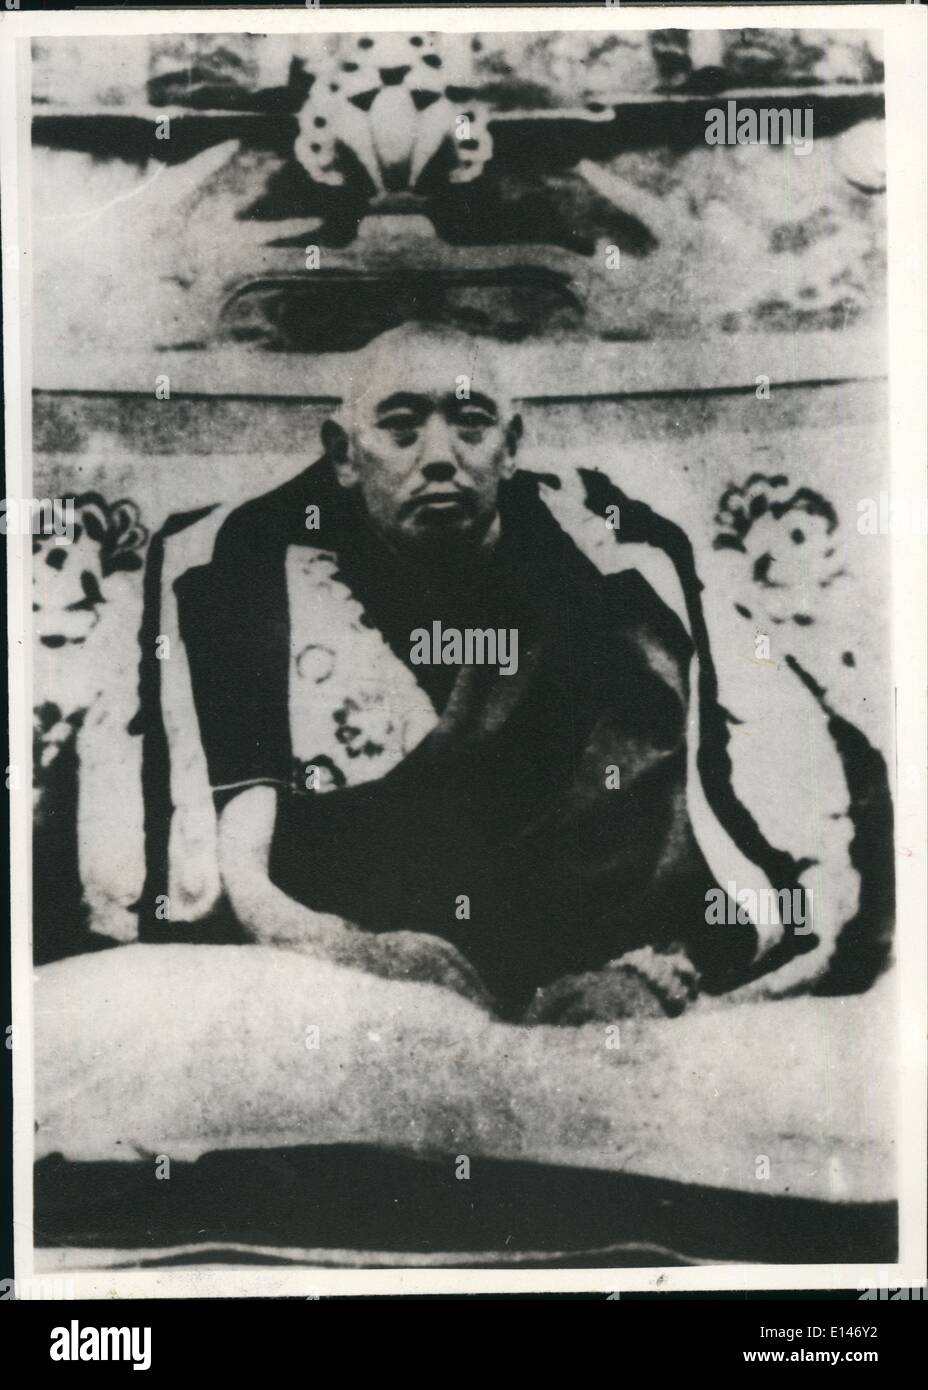 Apr. 16, 2012 - Thupten Gyatso the 13th Dalai Lama of Tibet Birth 1876--Death 1933. His reincarnated representative is Tenzin Gyatso the present Dalai Lam XIV. - Stock Image